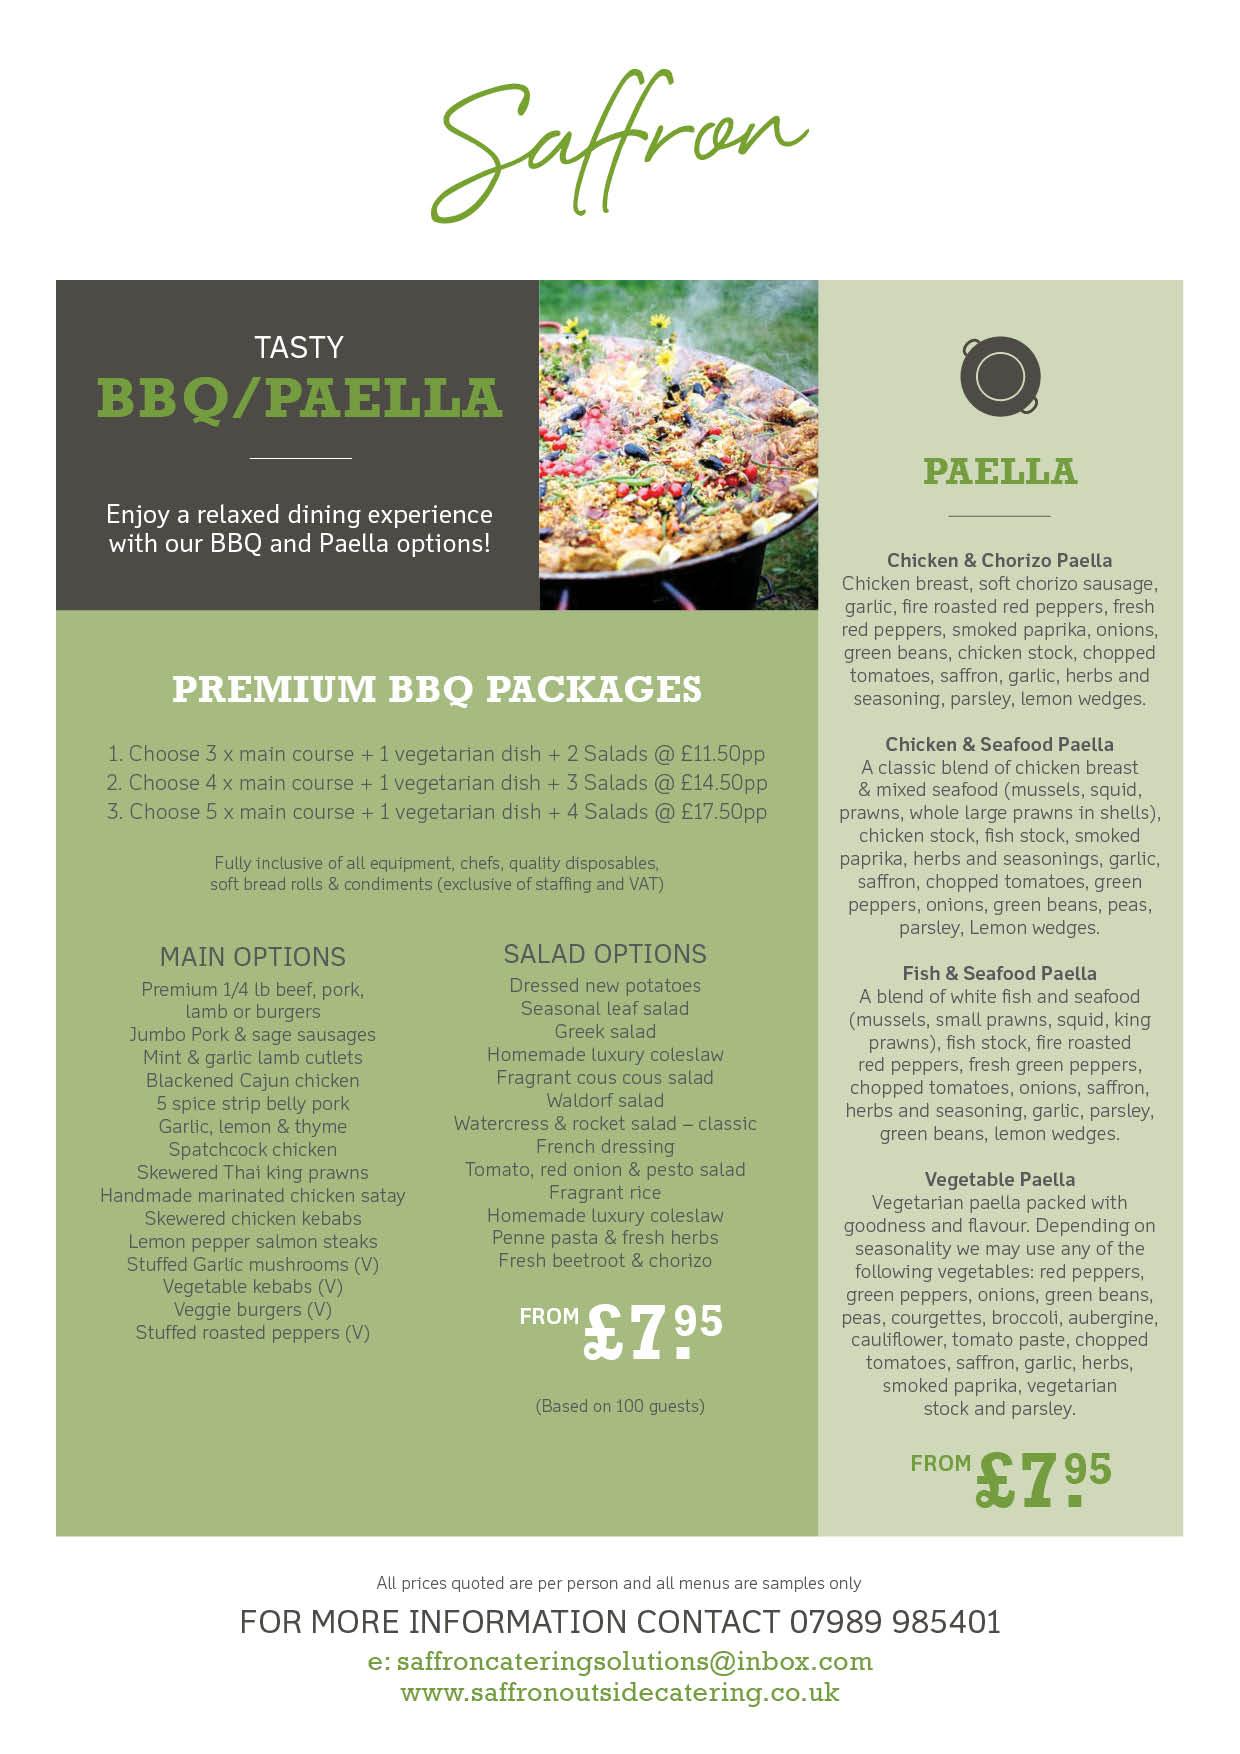 bbq paella - Paella Catering Nottingham